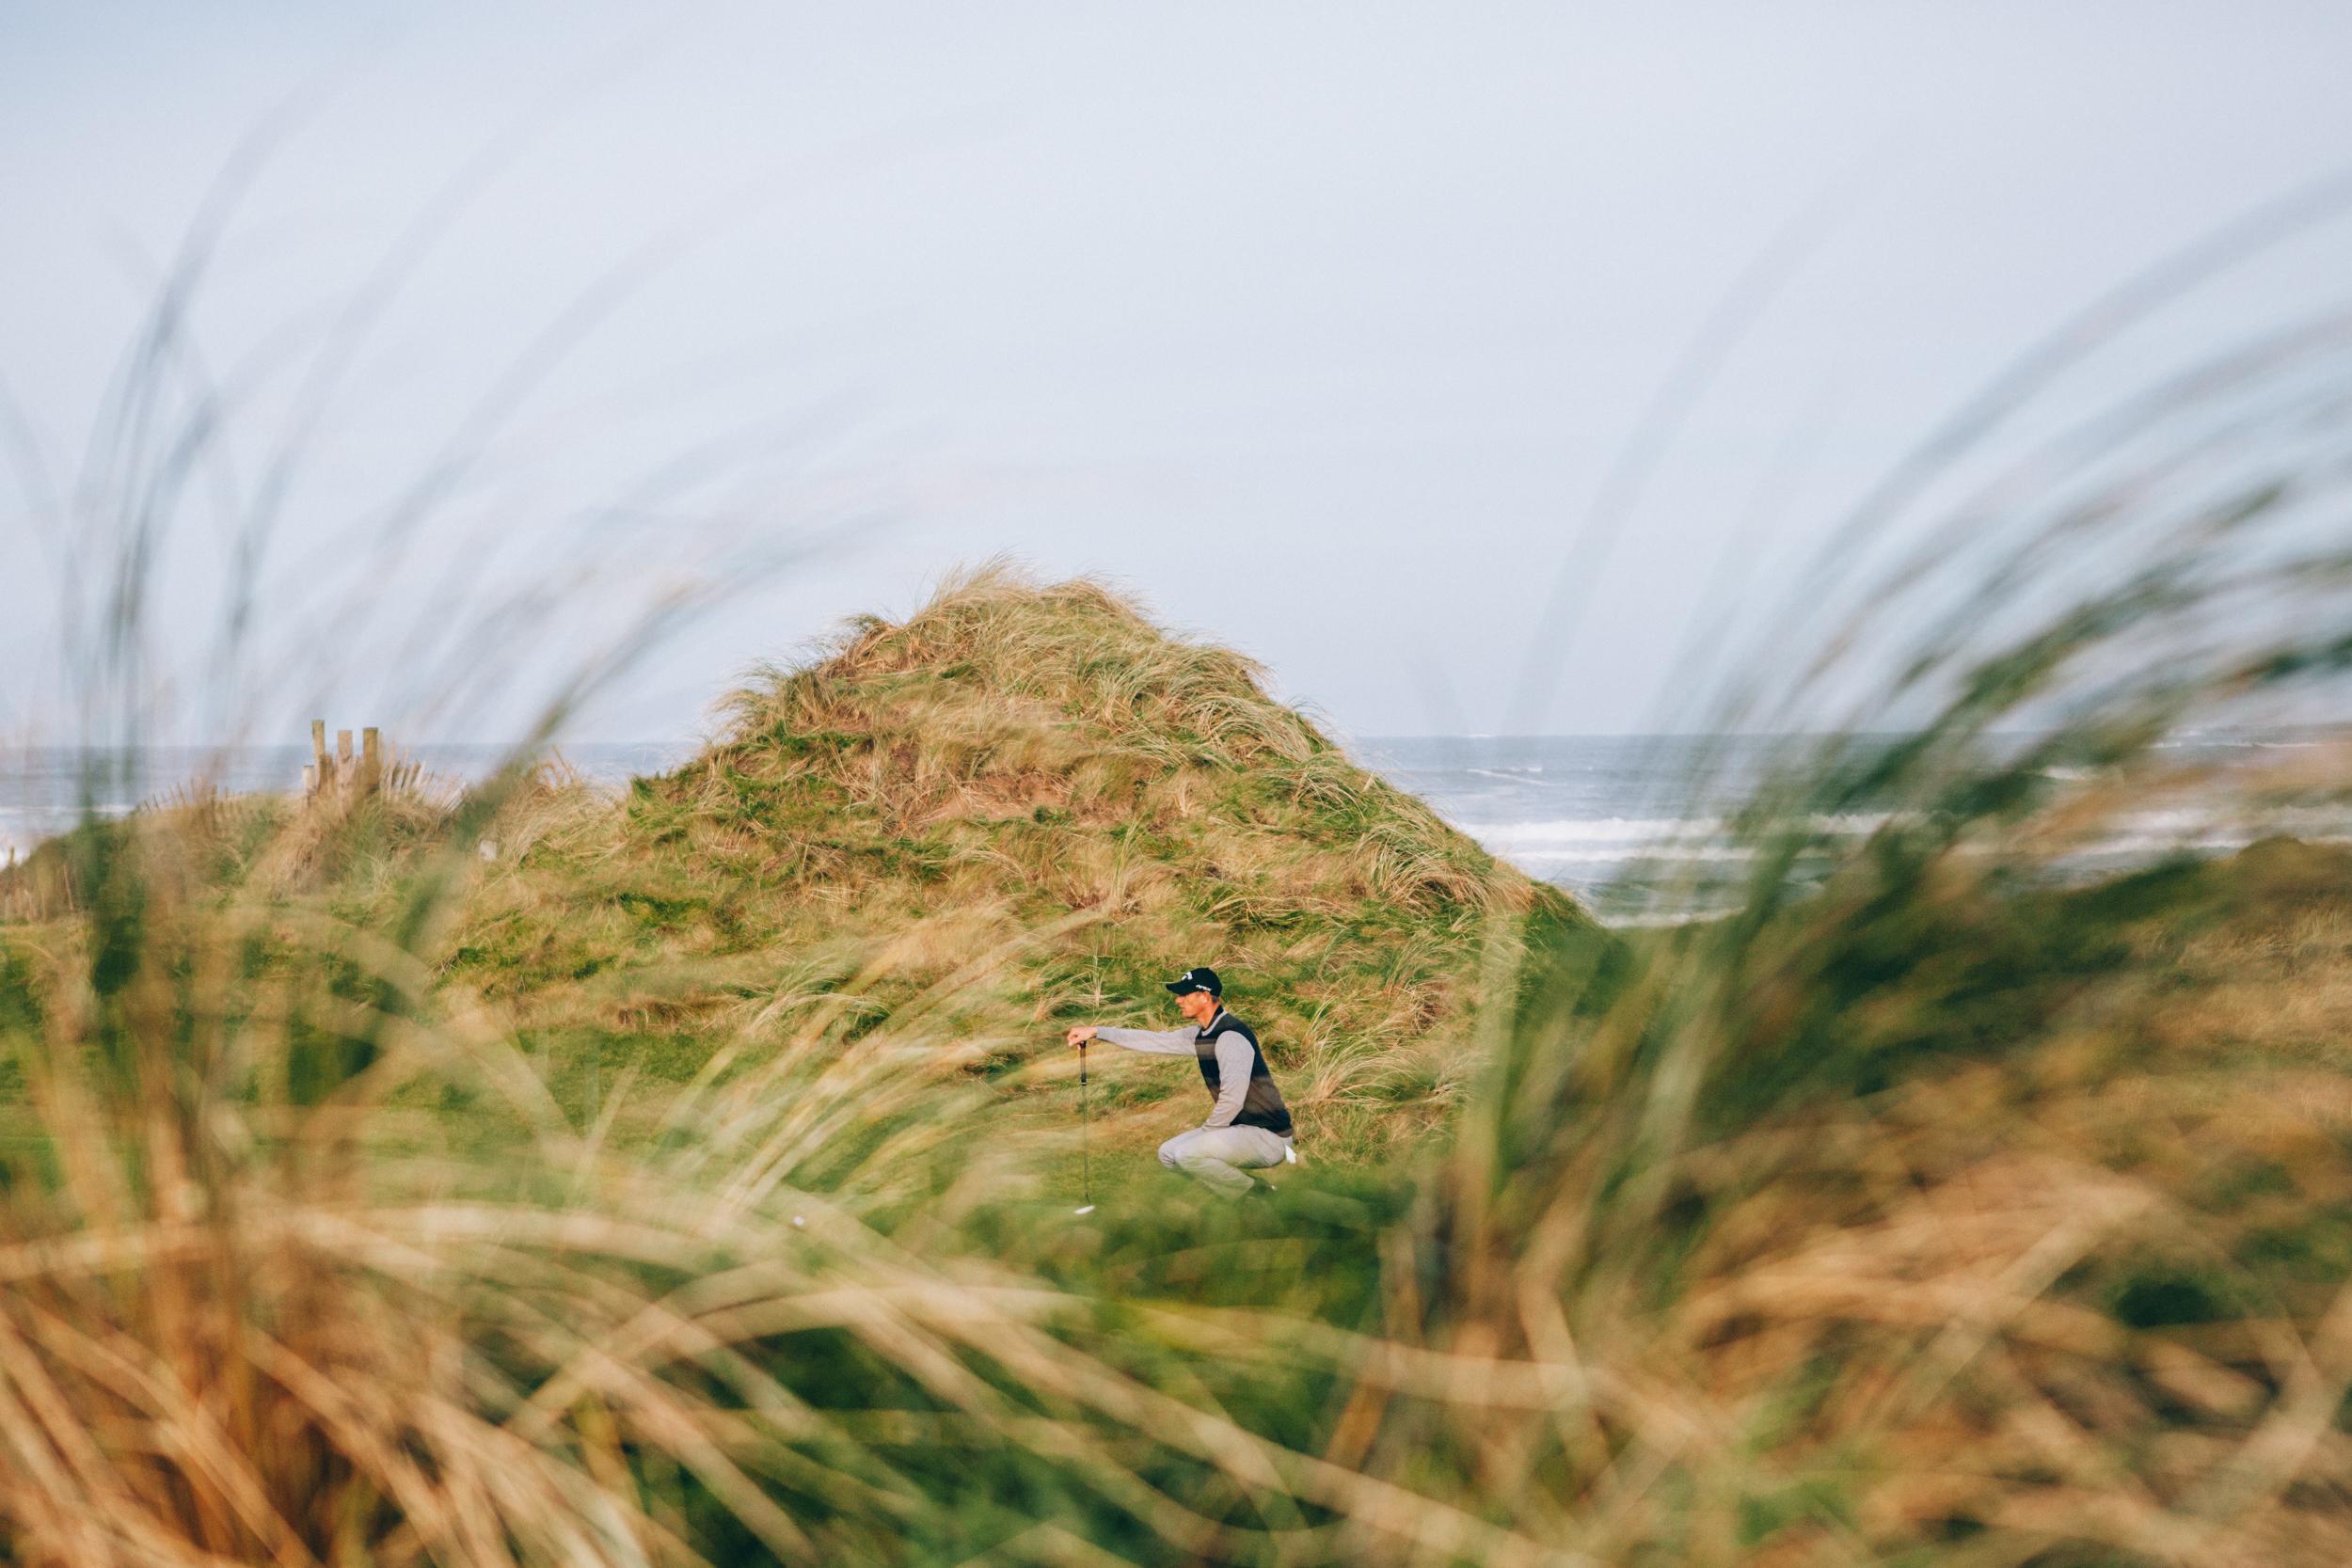 DUNNING GOLF - DOONBEG, IRELAND